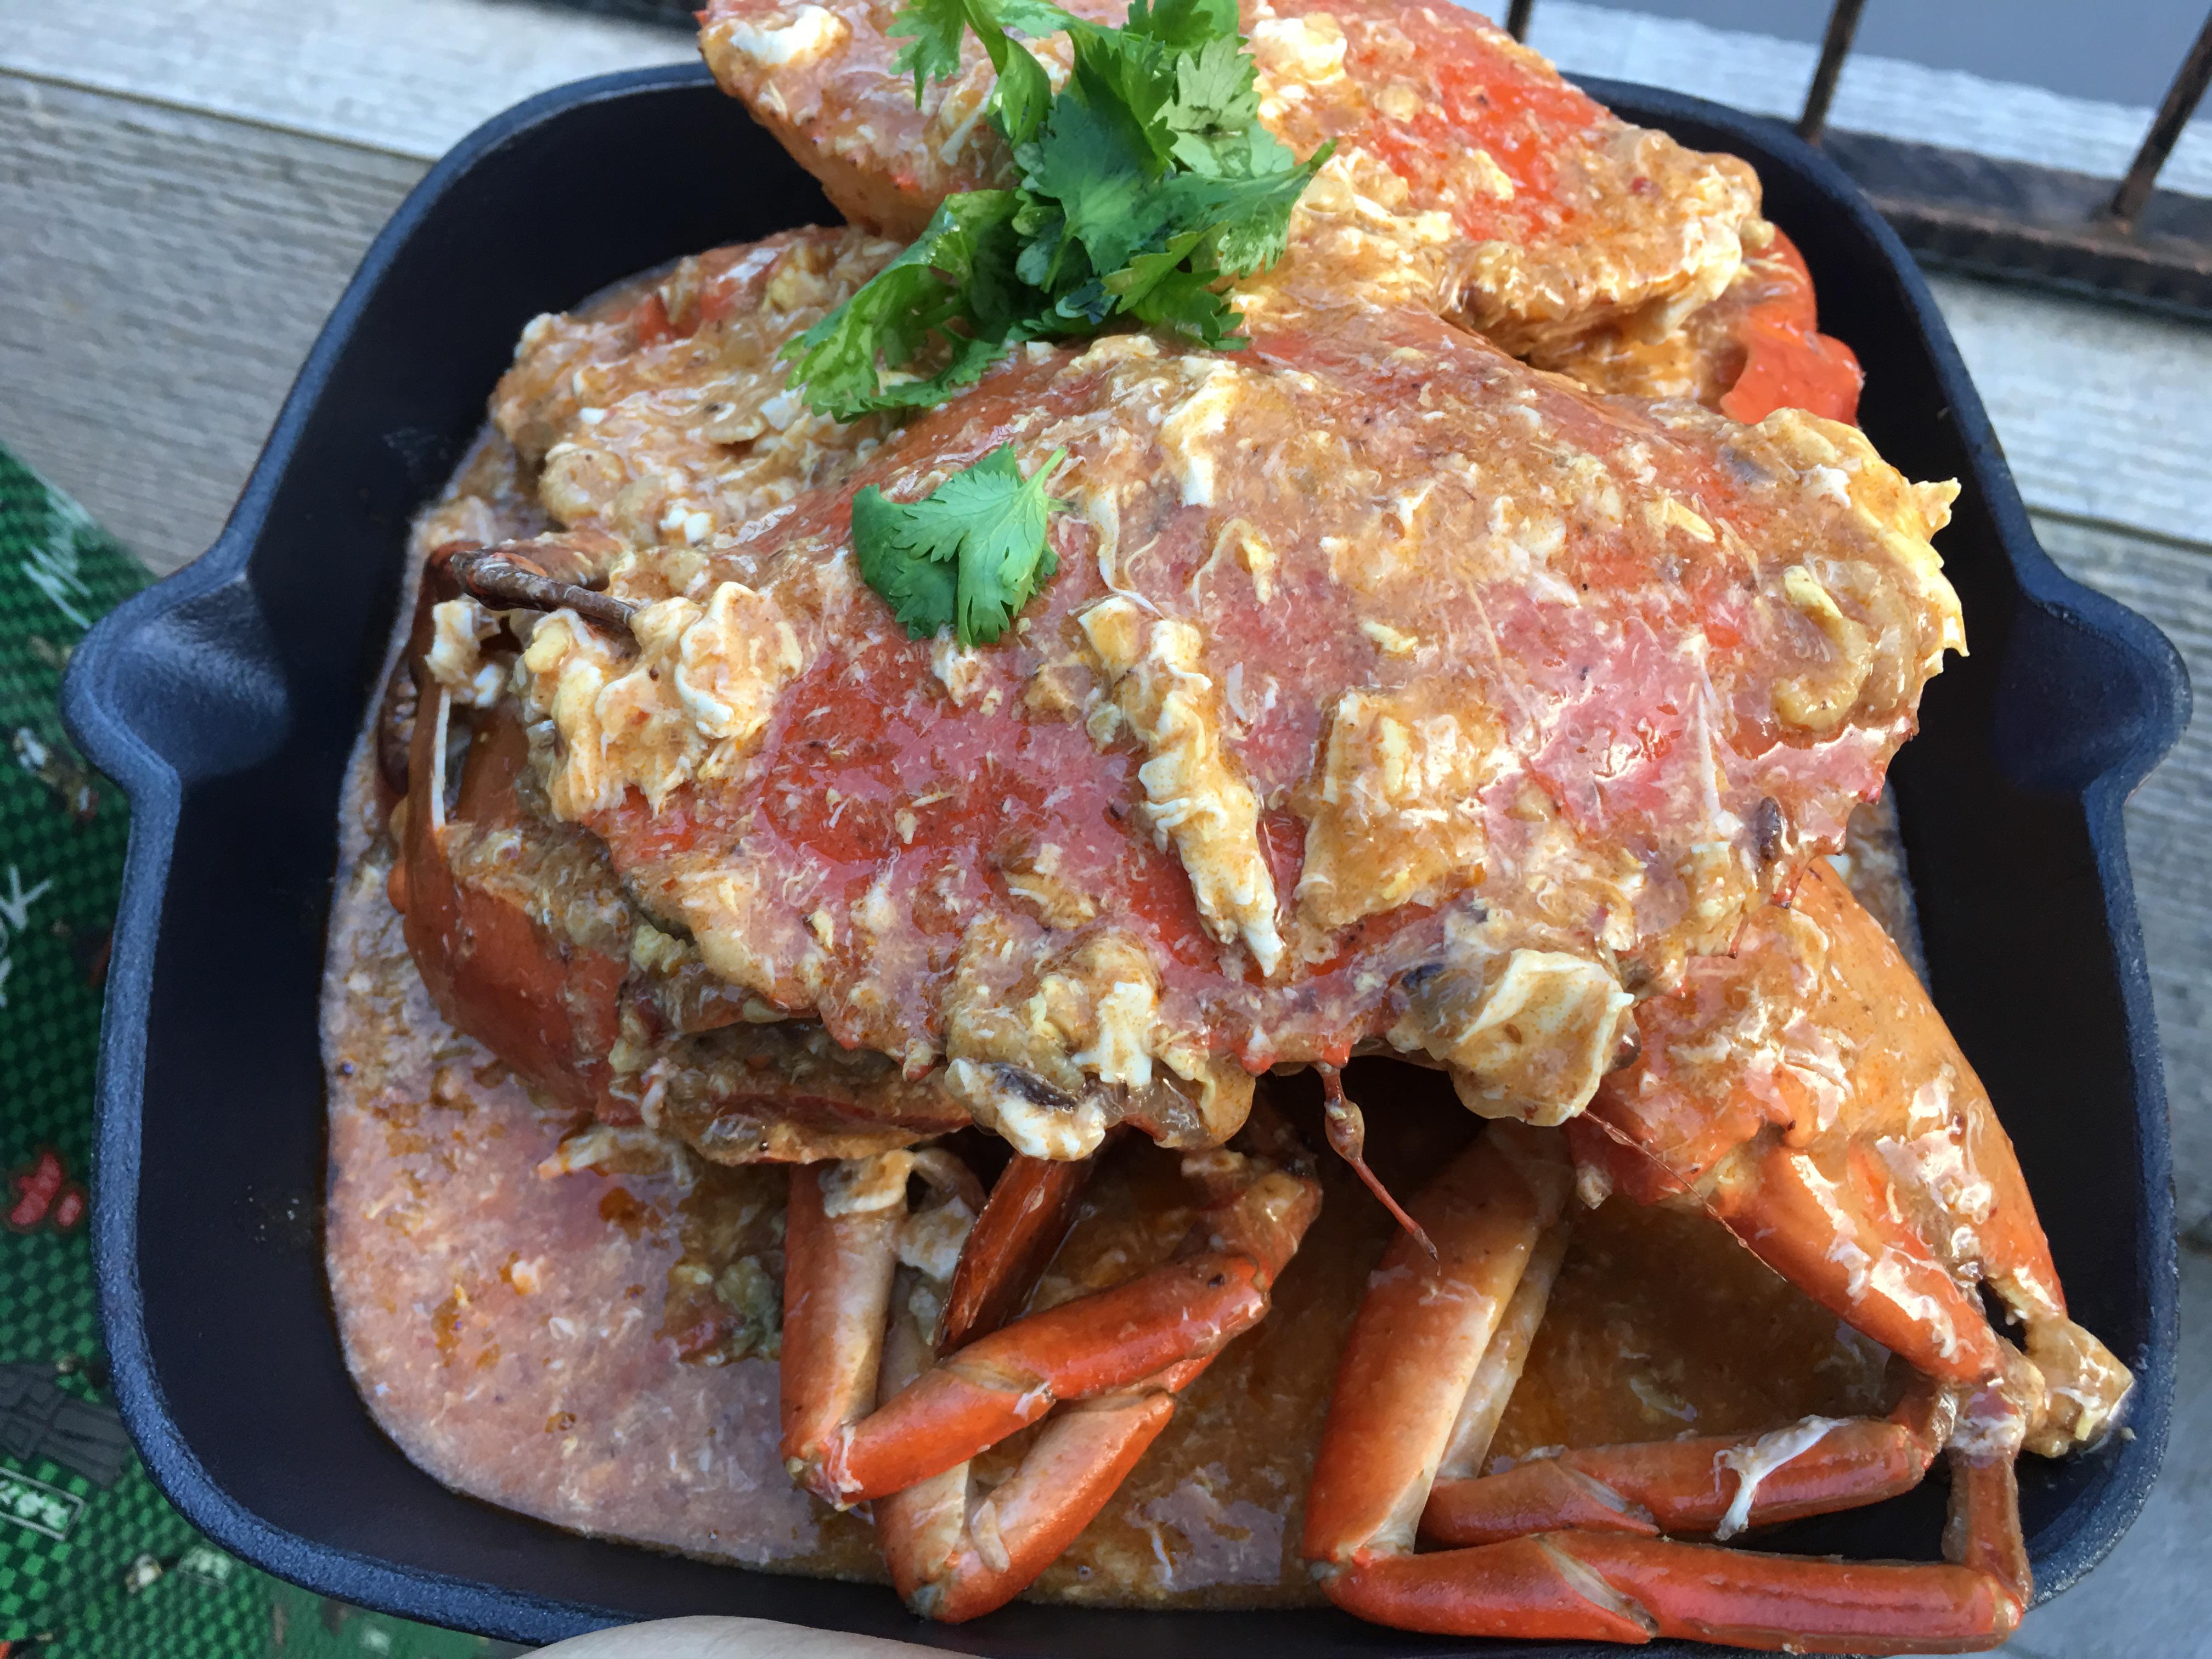 Easy Recipe for the Perfect Singapore Chilli Crab // 新加坡辣椒螃蟹